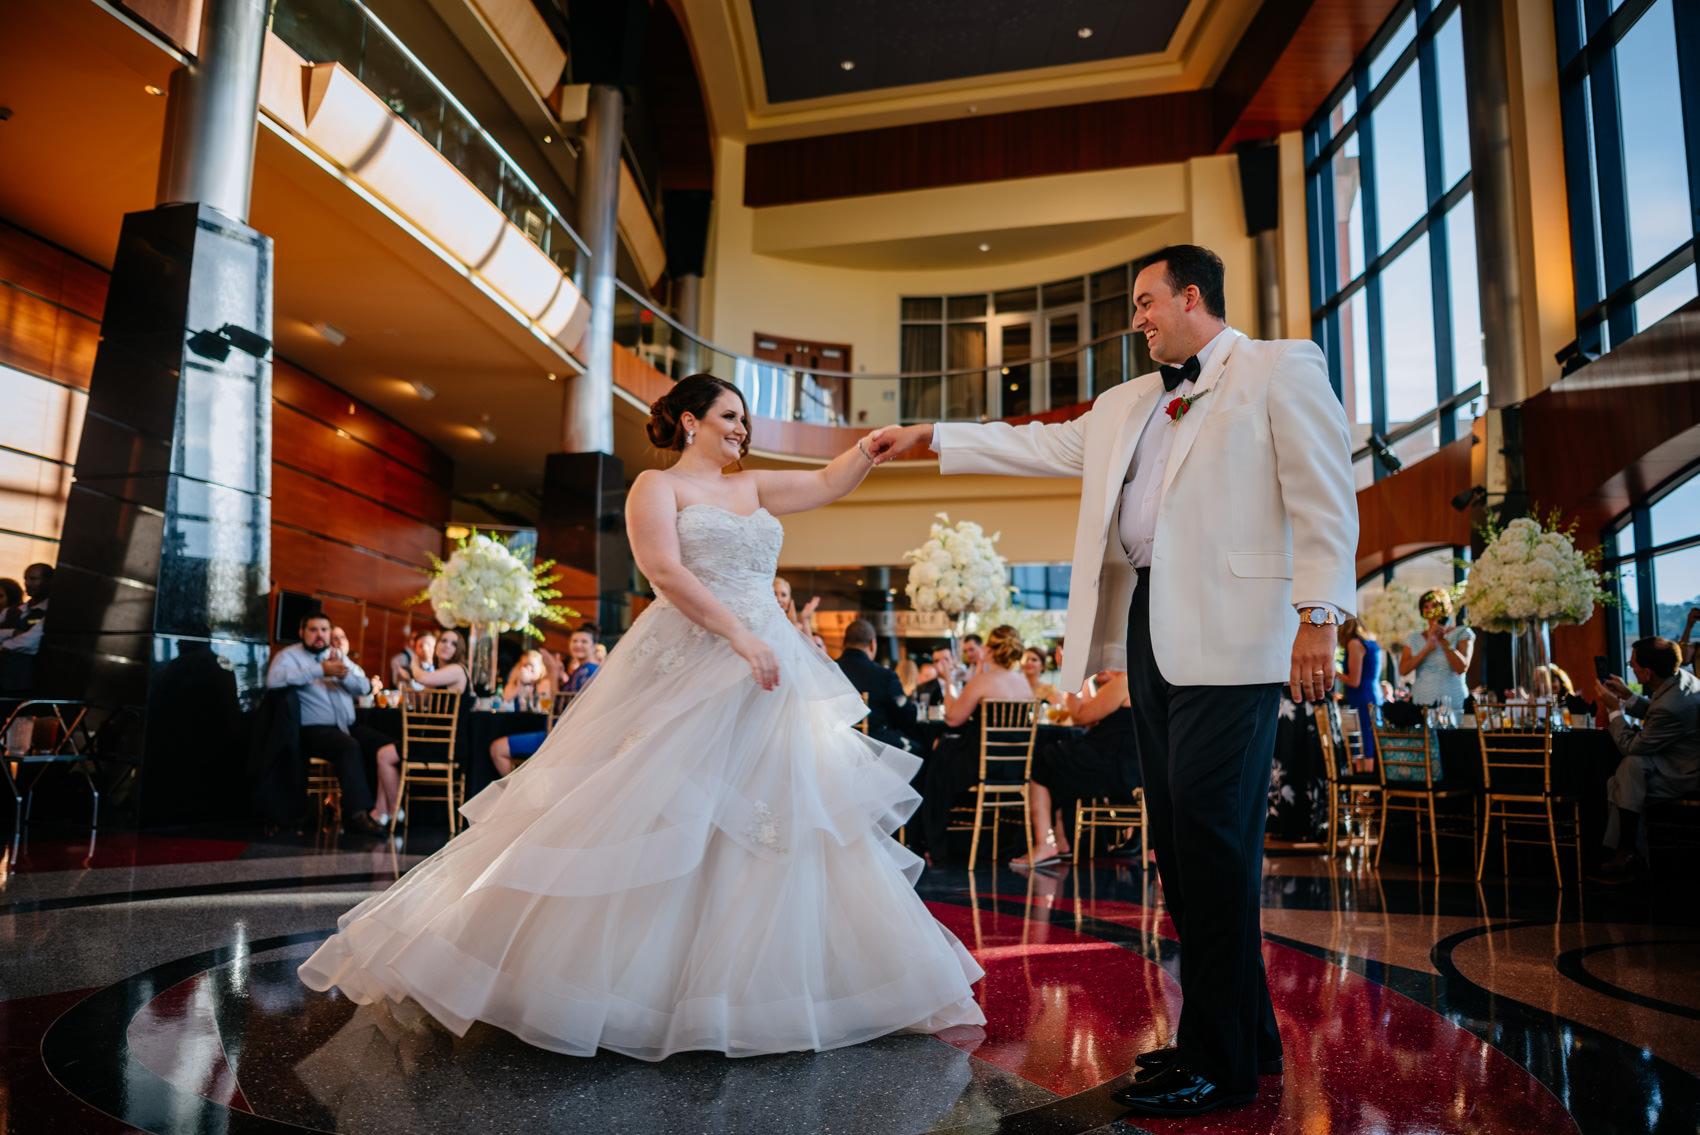 018-oberports-wedding-reception-portfolio